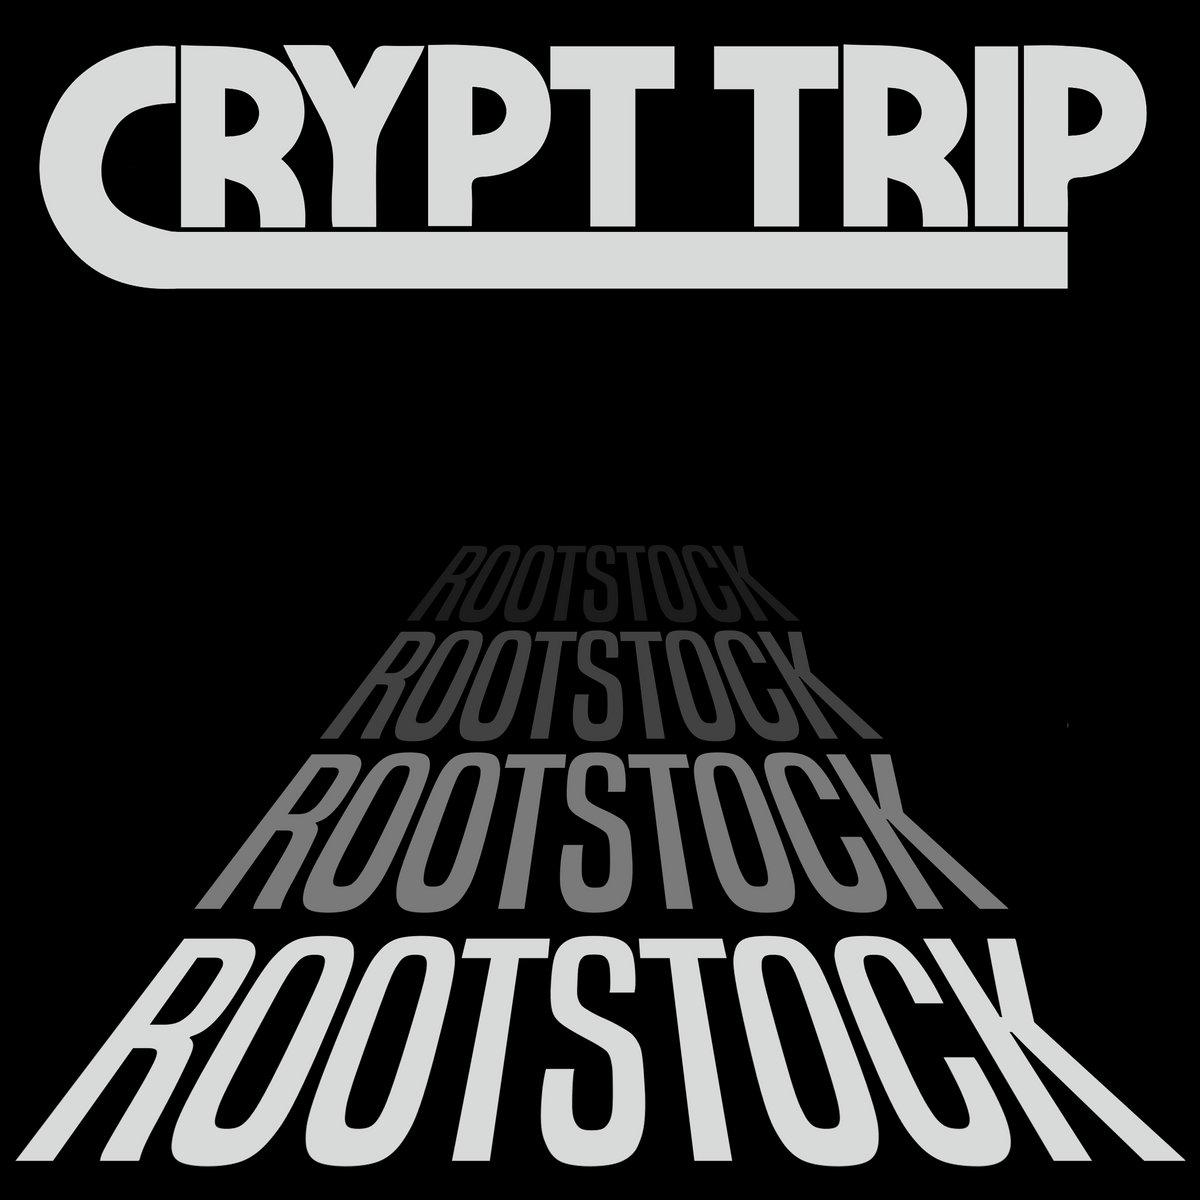 https://crypttrip.bandcamp.com/album/rootstock